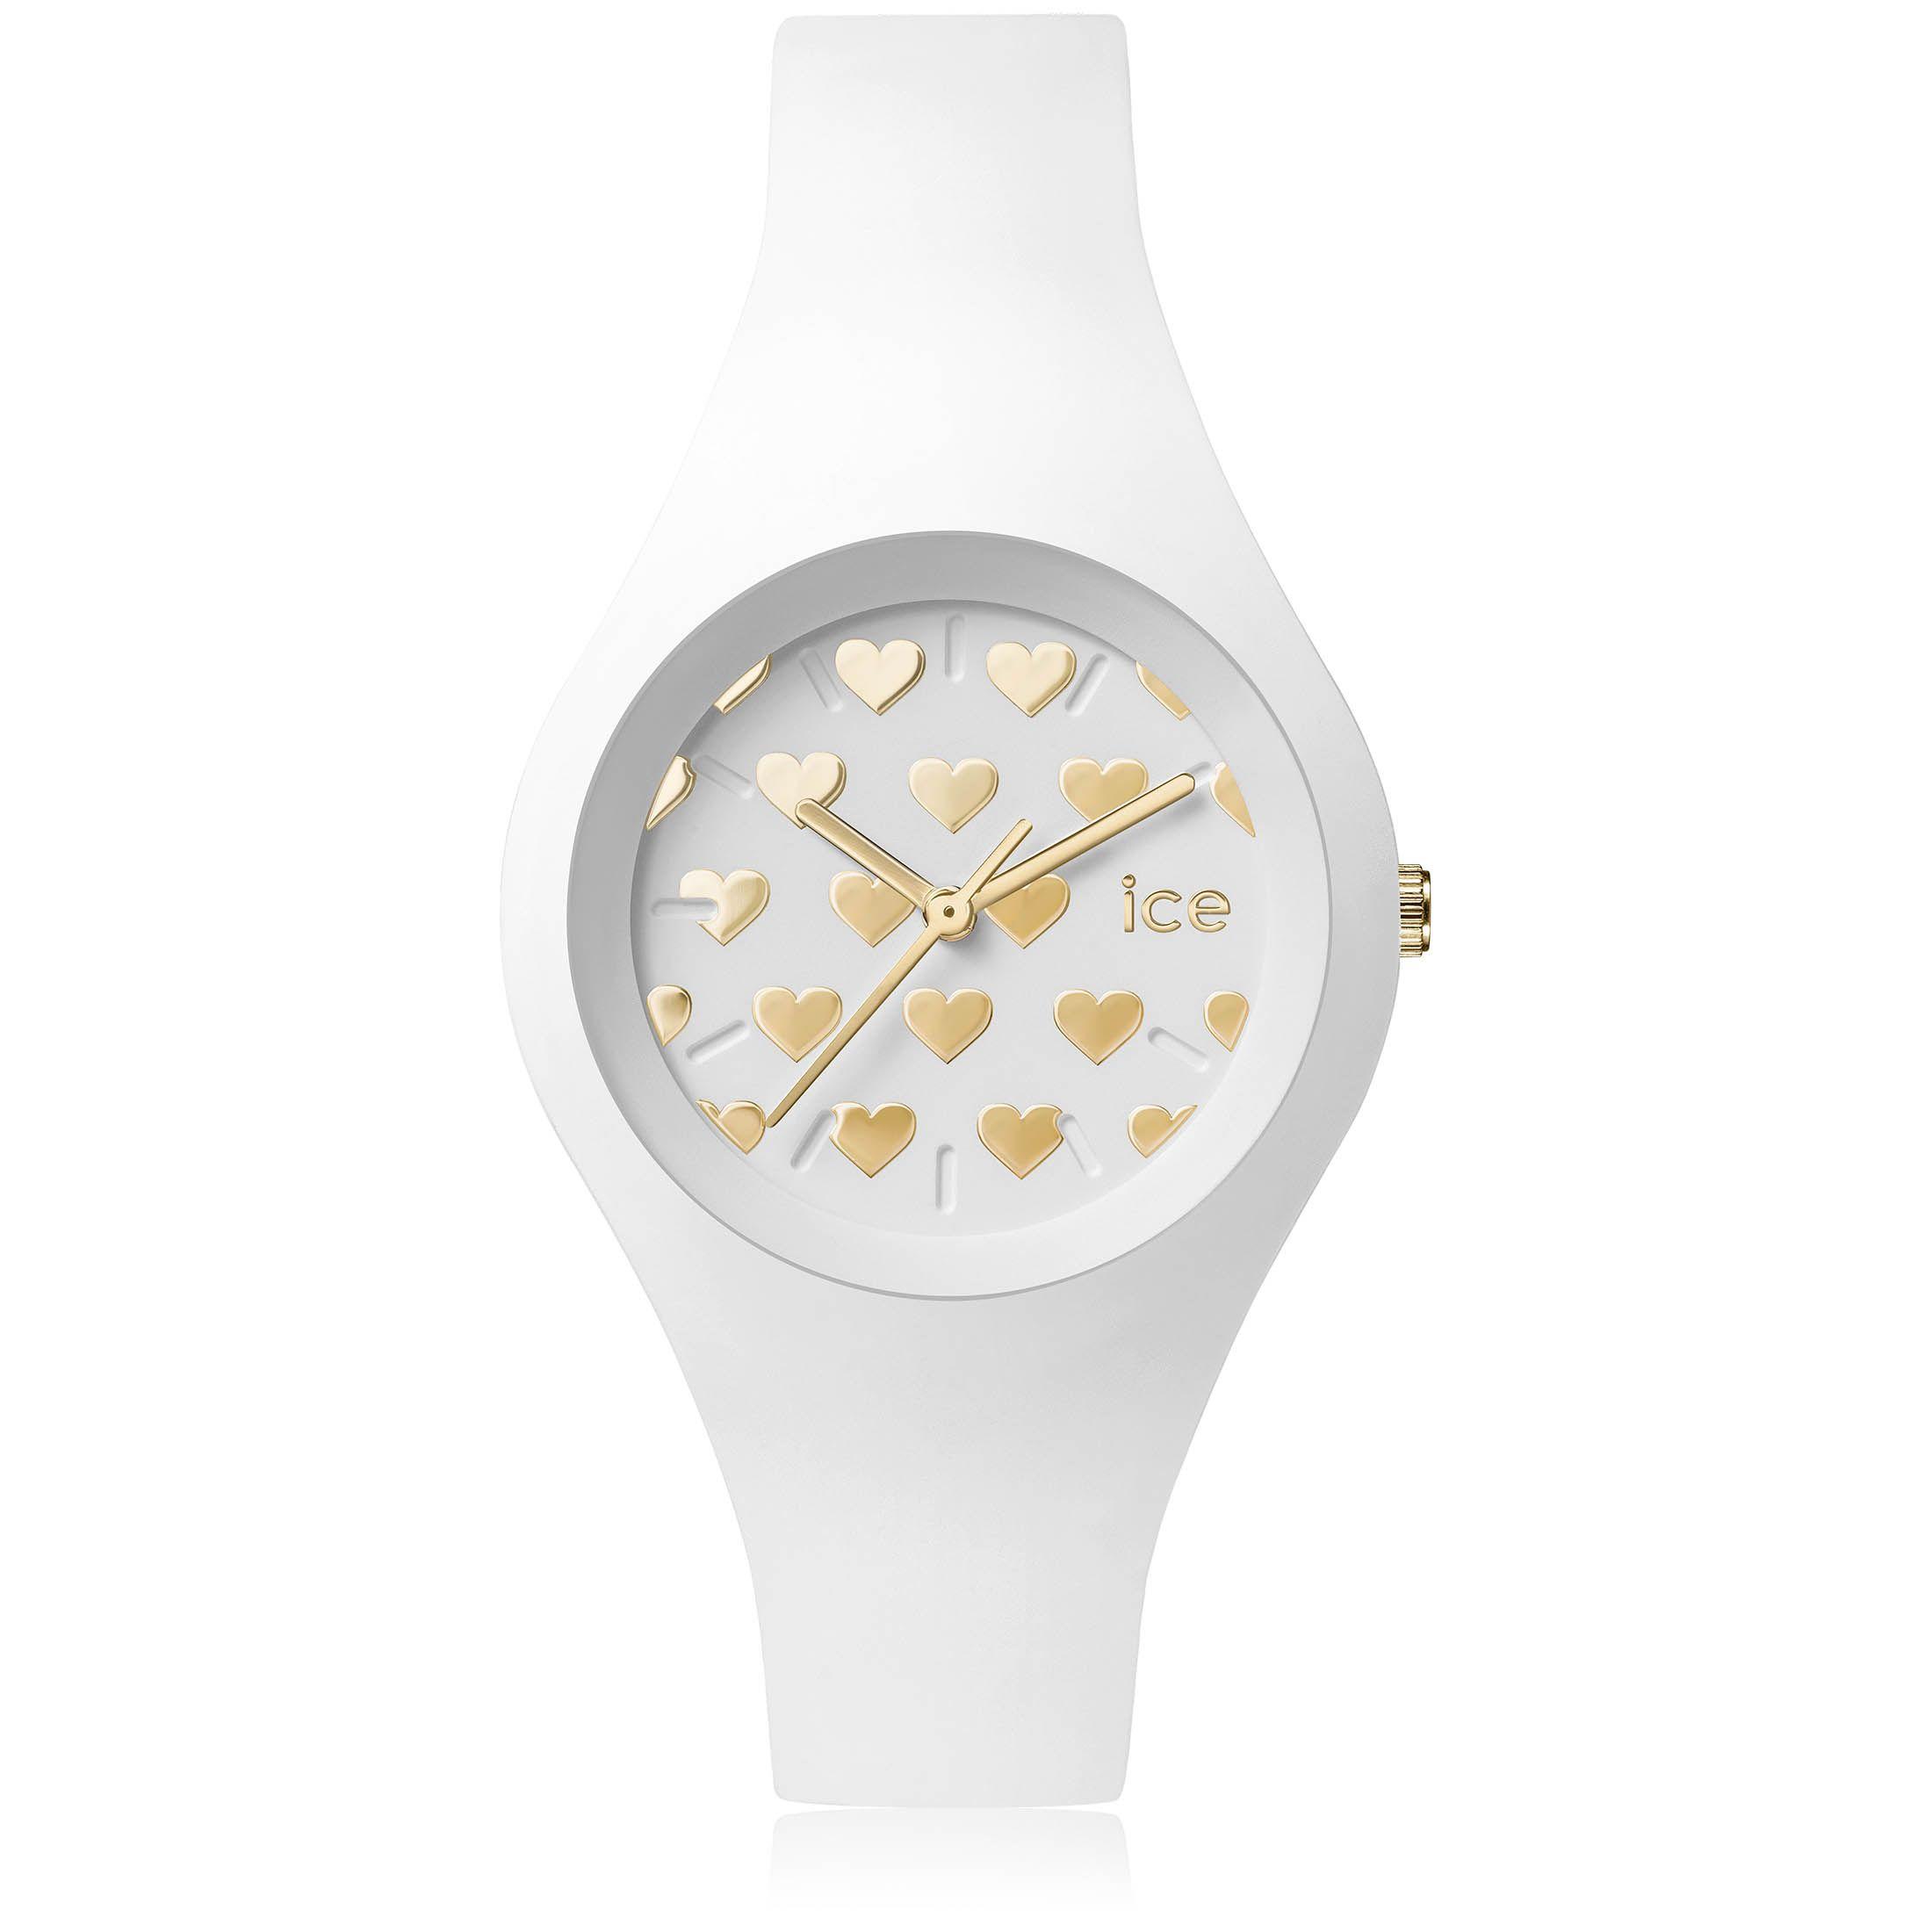 b9983e335cb22e ICE love   montre Ice watch   Pinterest   Ice watch